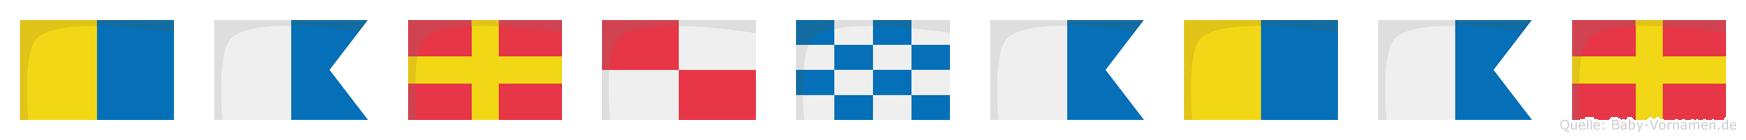 Karunakar im Flaggenalphabet